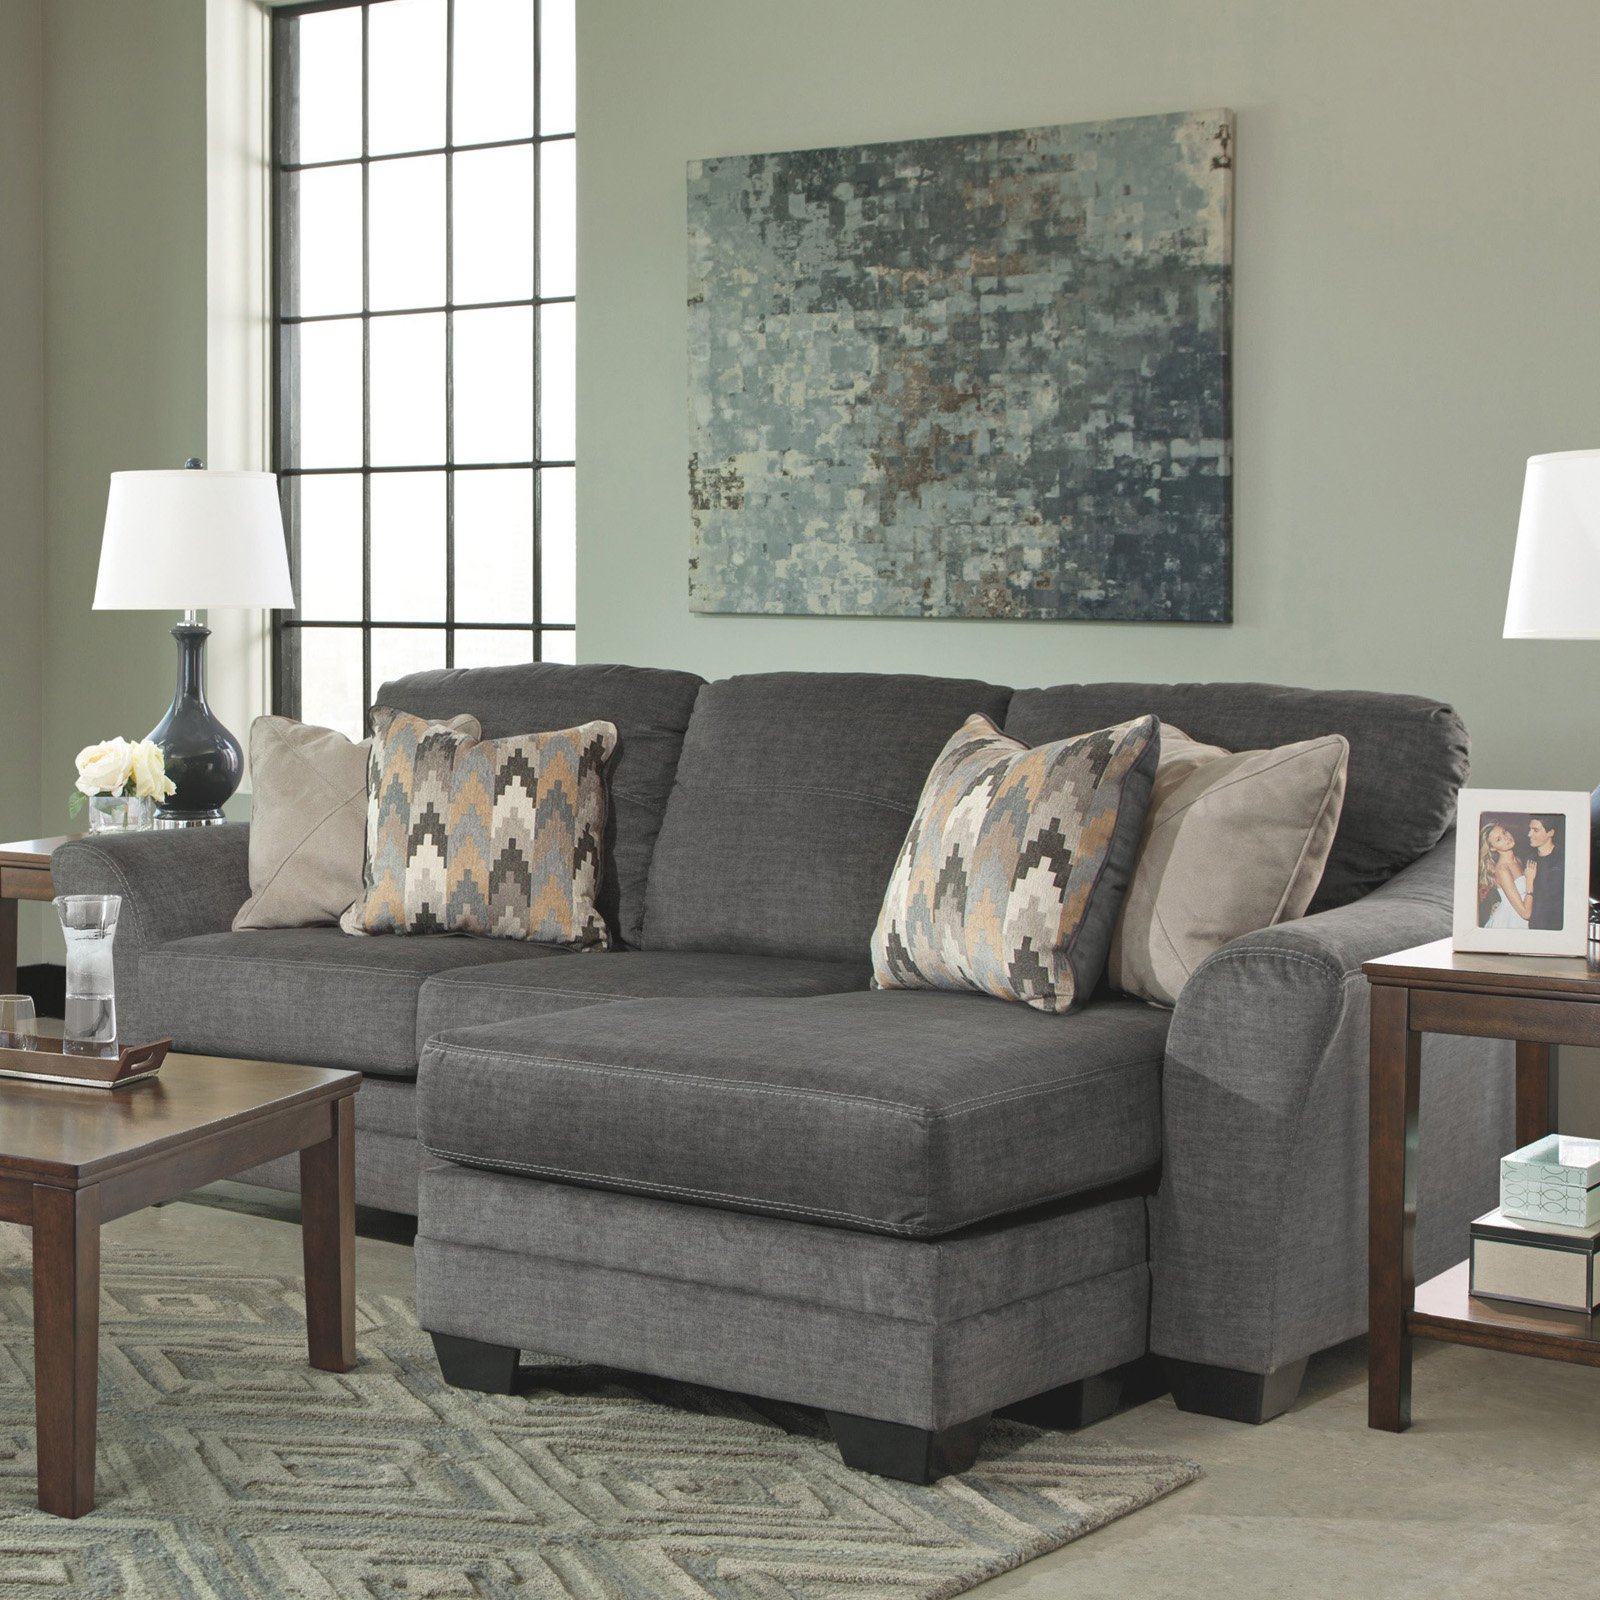 Benchcraft Braxlin Charcoal Chaise Sofa Reviews Baci